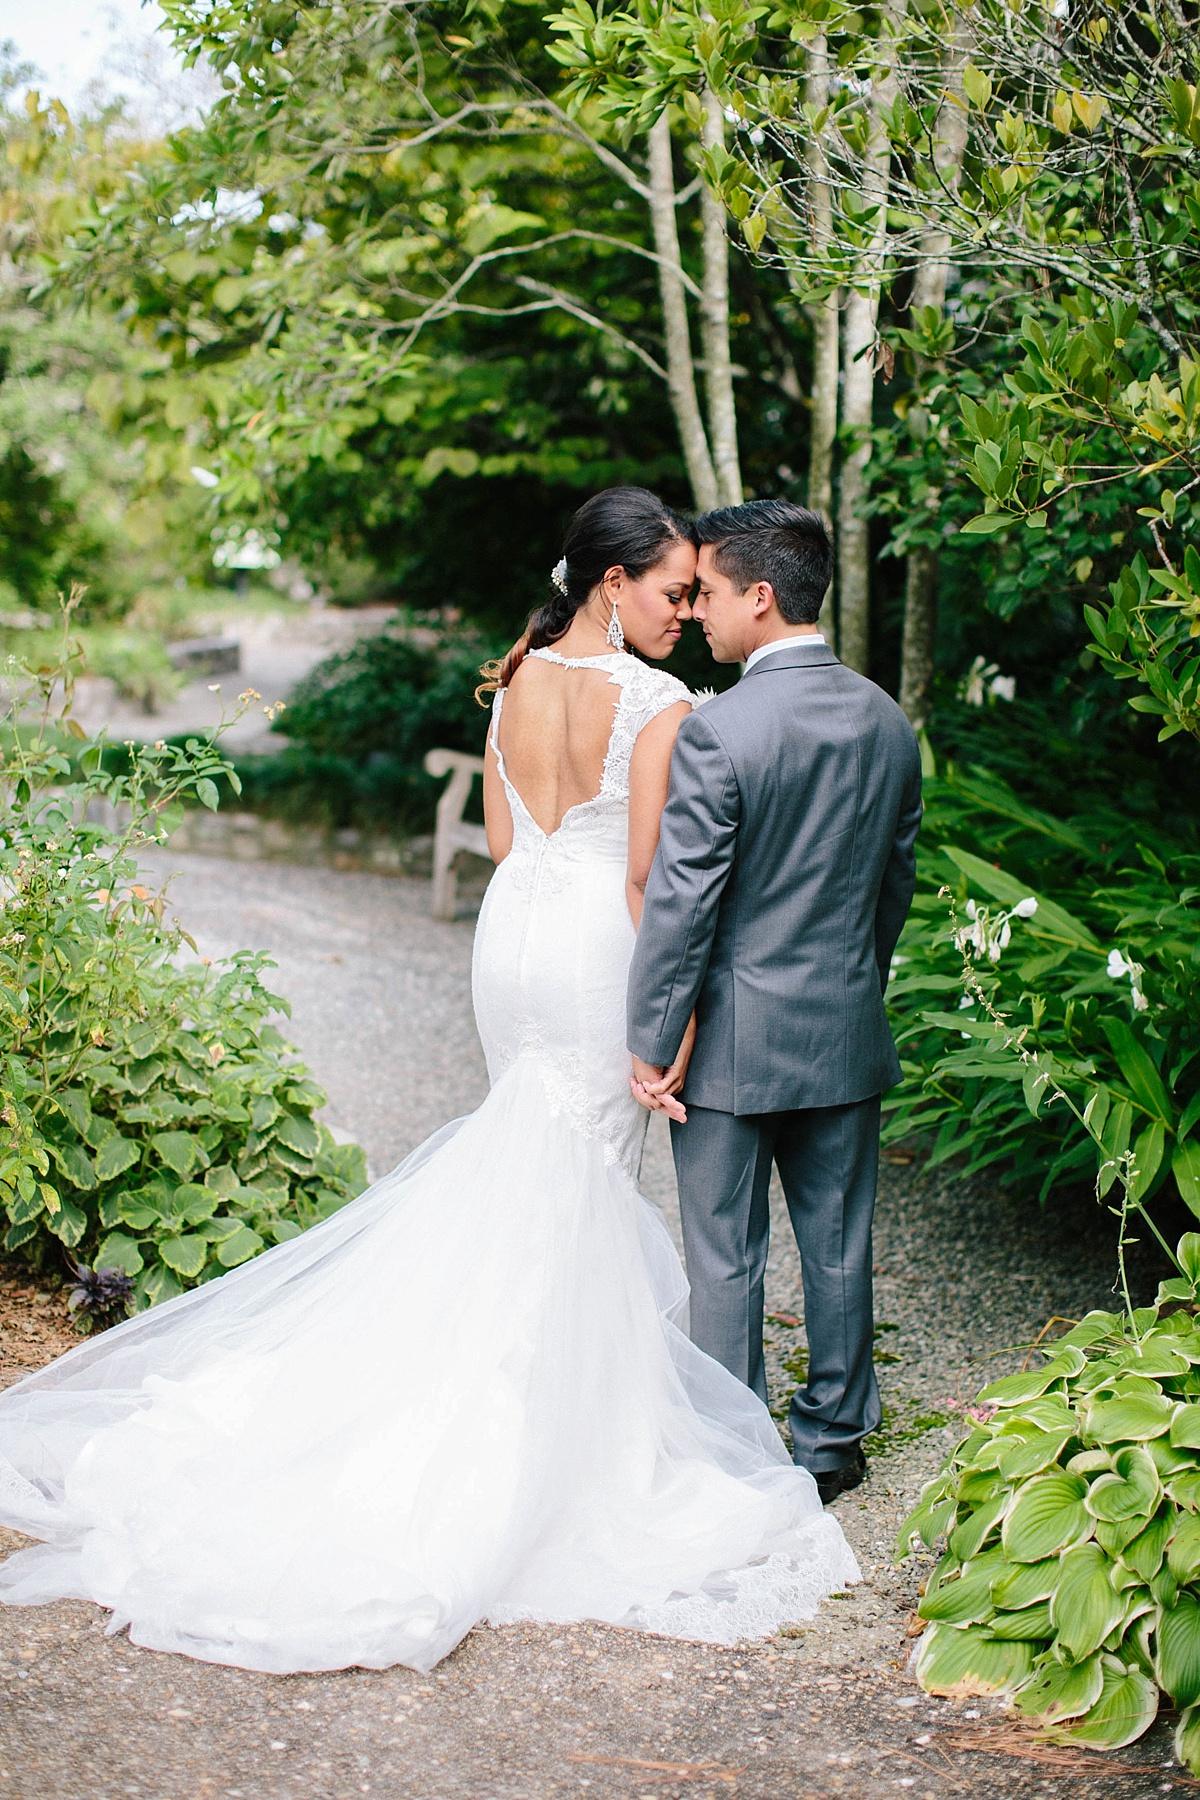 ace low back wedding dress - davids bridal